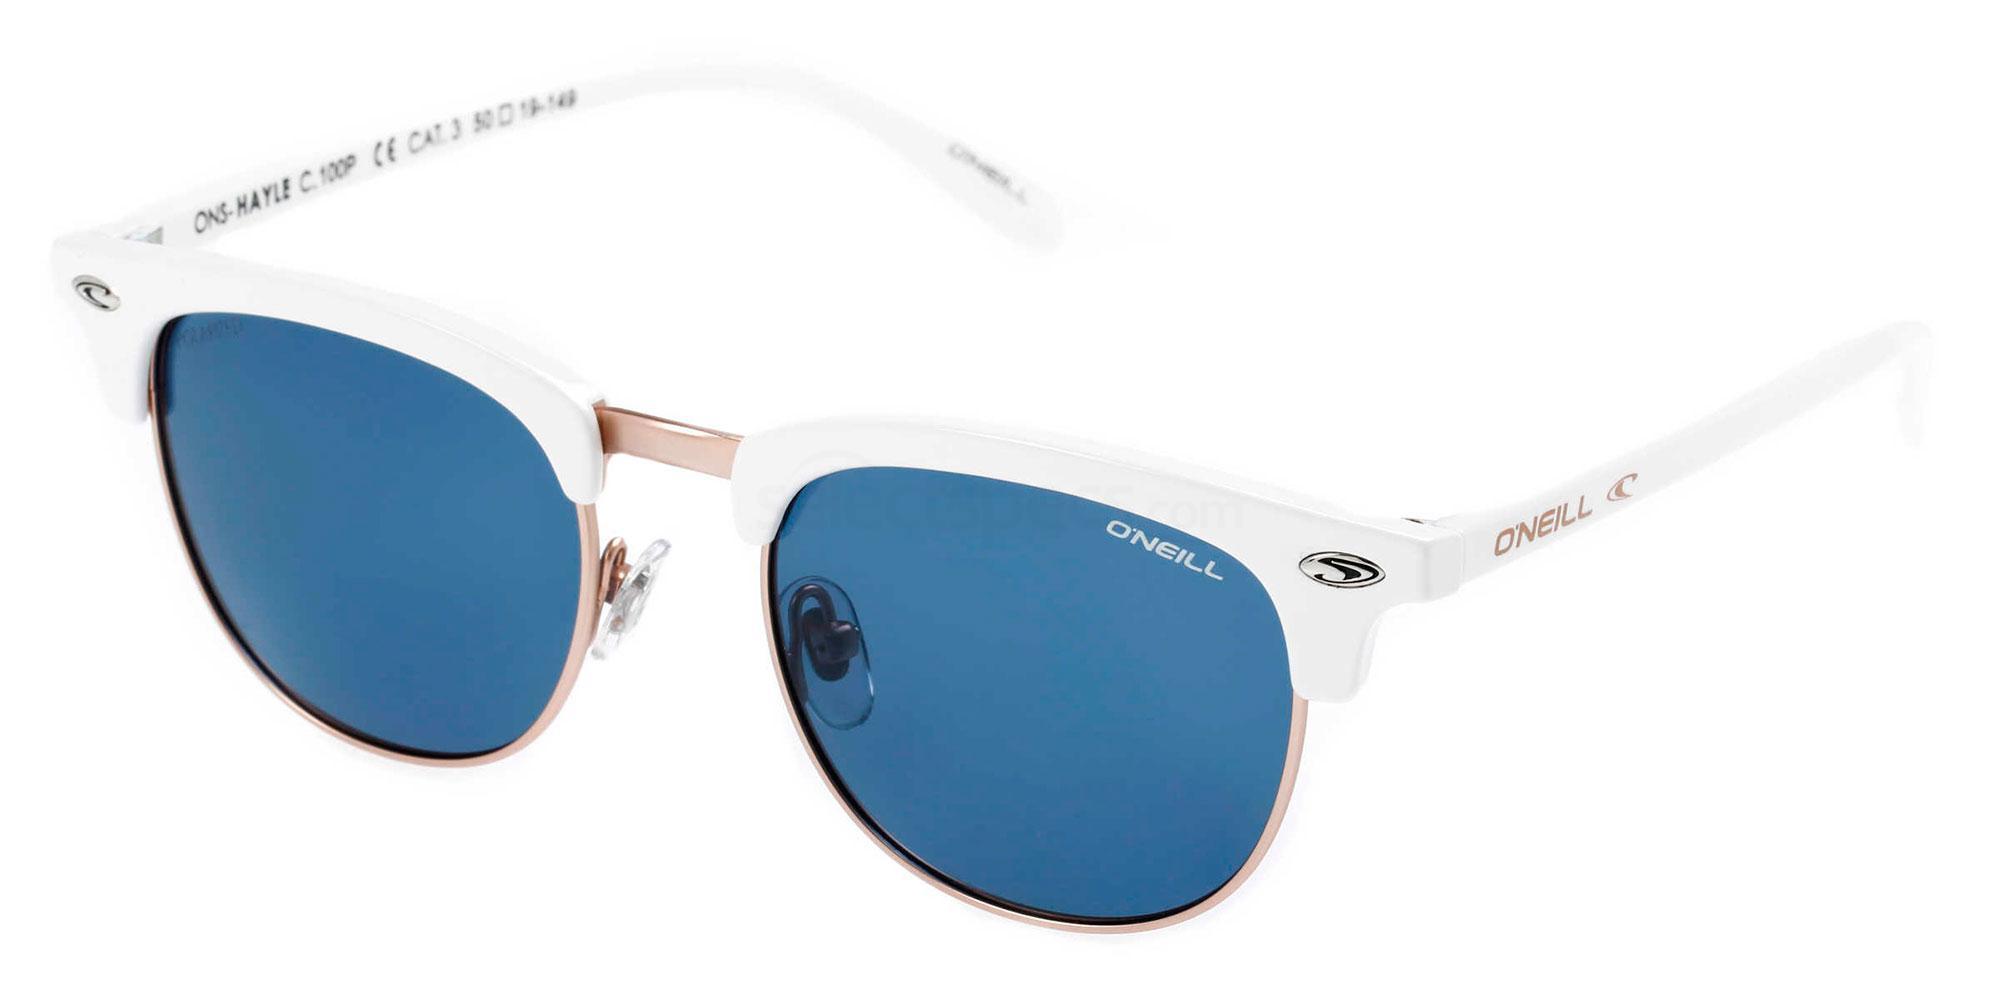 100P ONS-HAYLE Sunglasses, O'Neill